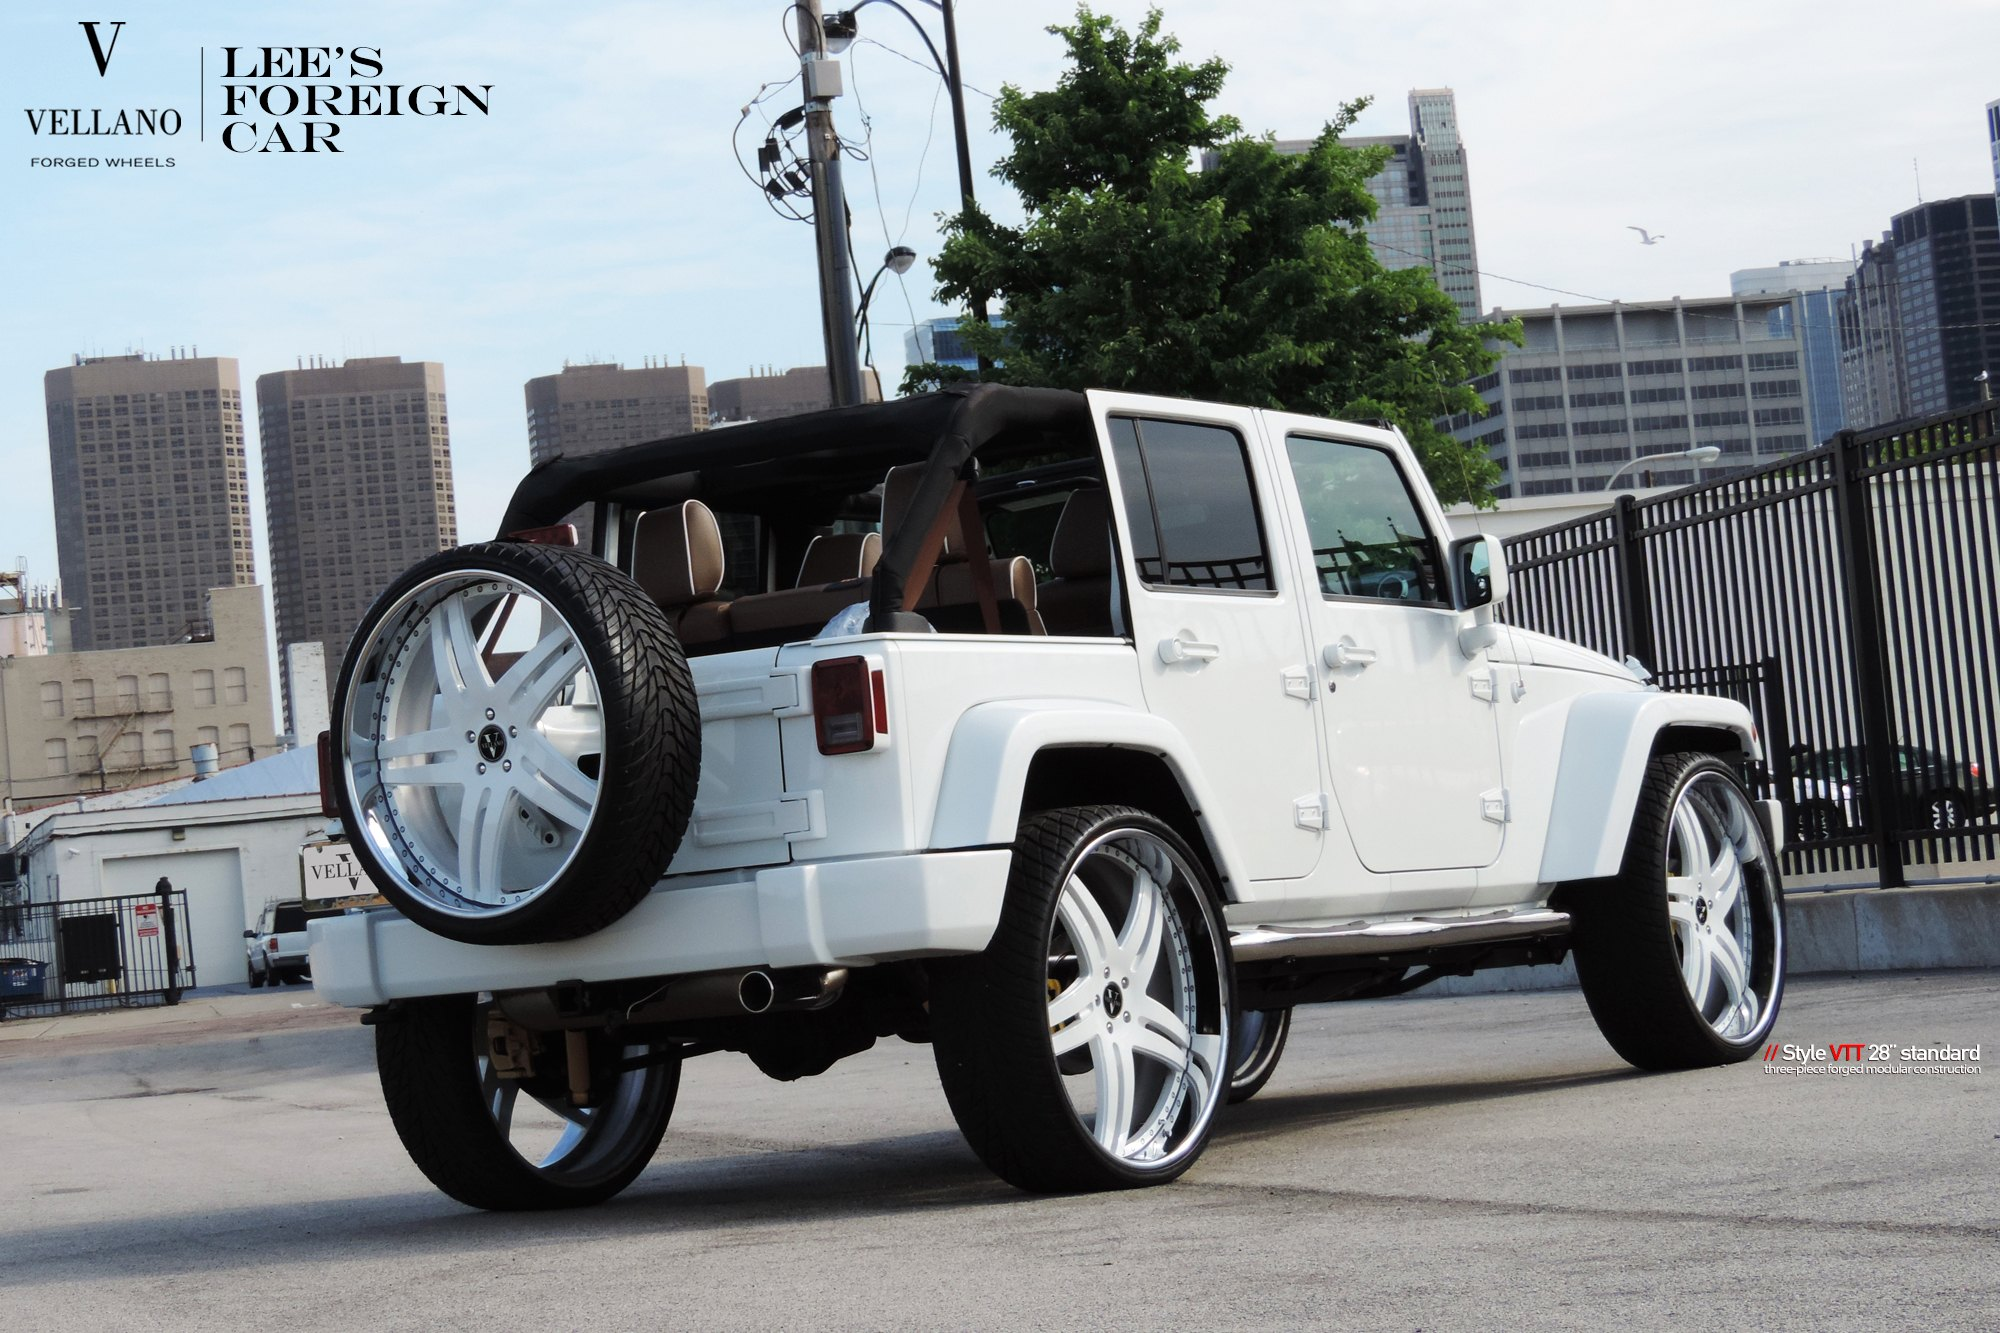 White On White Customized Jeep Wrangler Carid Com Gallery